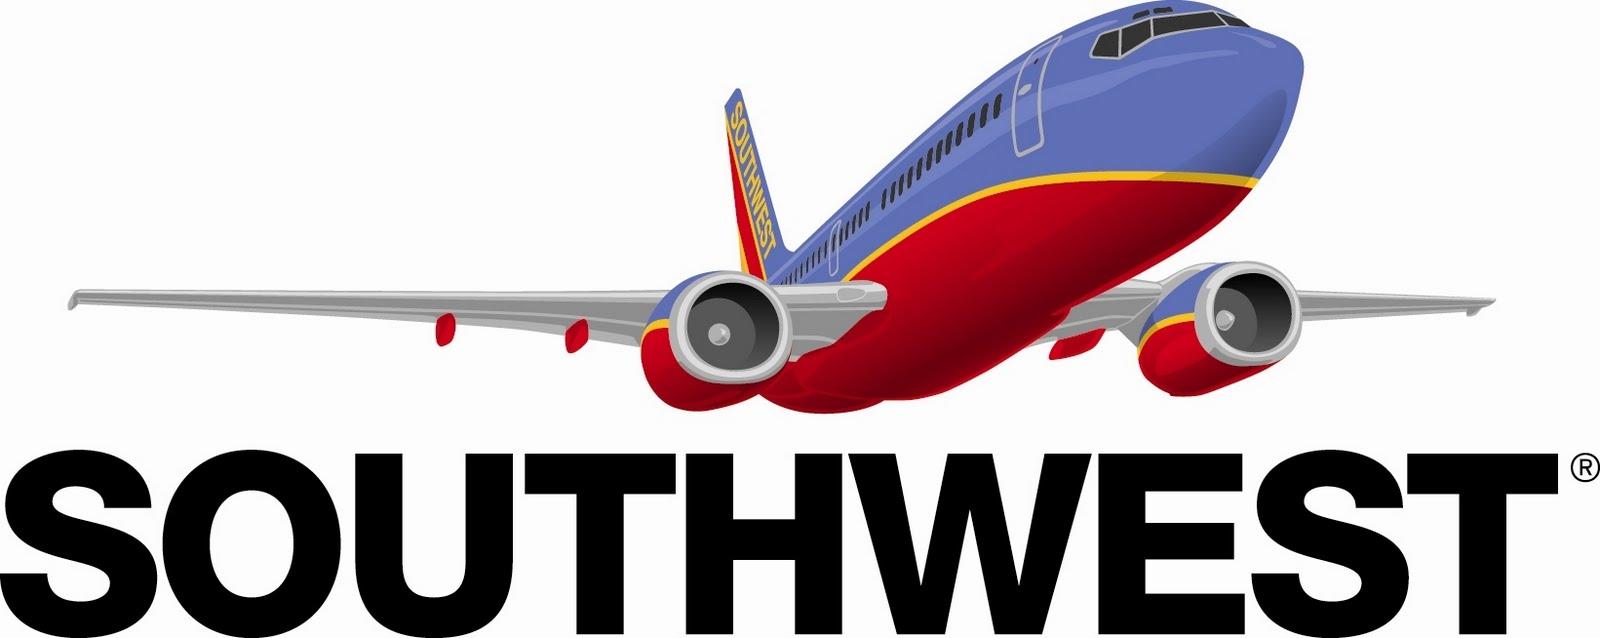 southwest-airlines-slogan.jpg